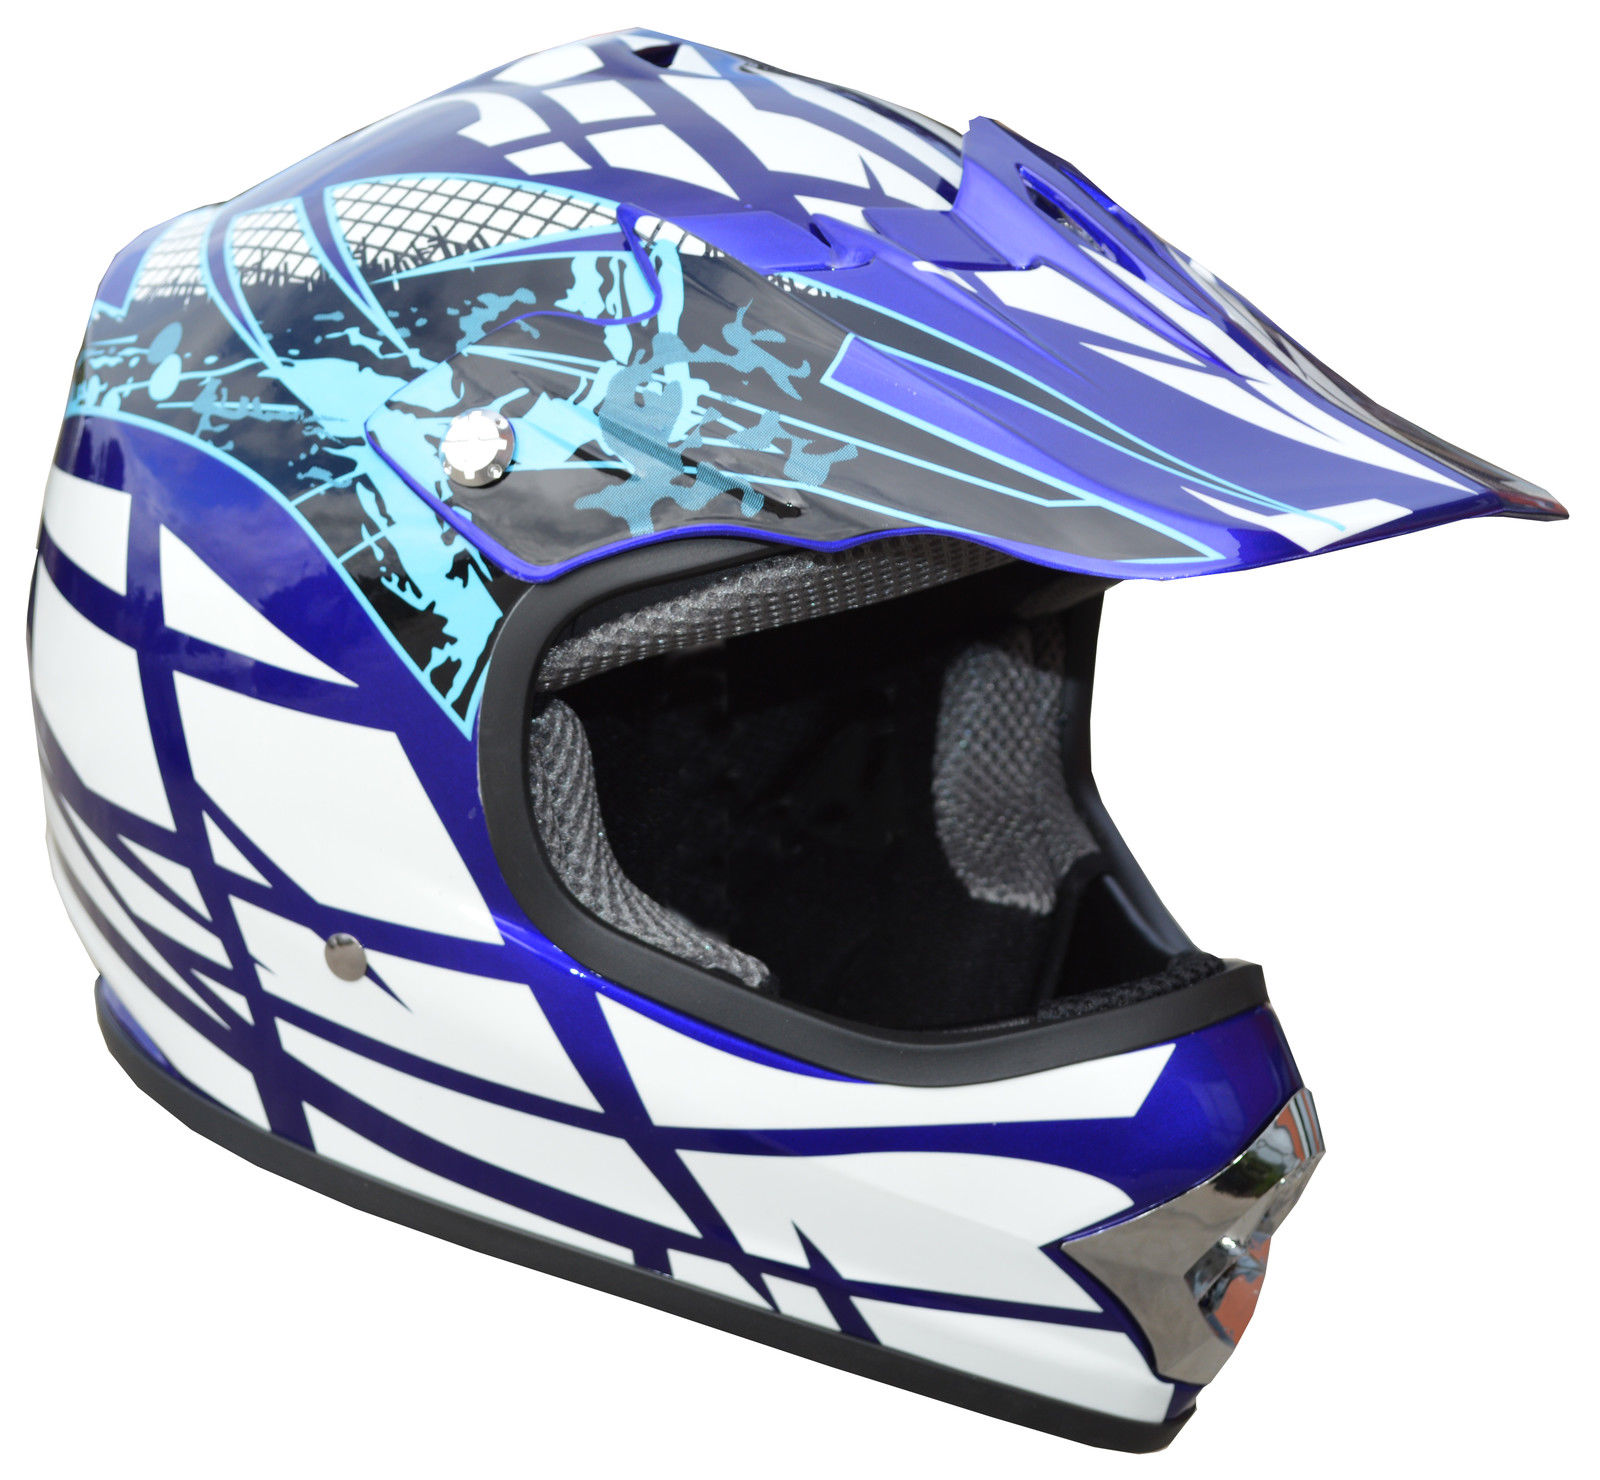 Motocross Helmets Kids Youth :: KIDS YOUTH MOTOCROSS